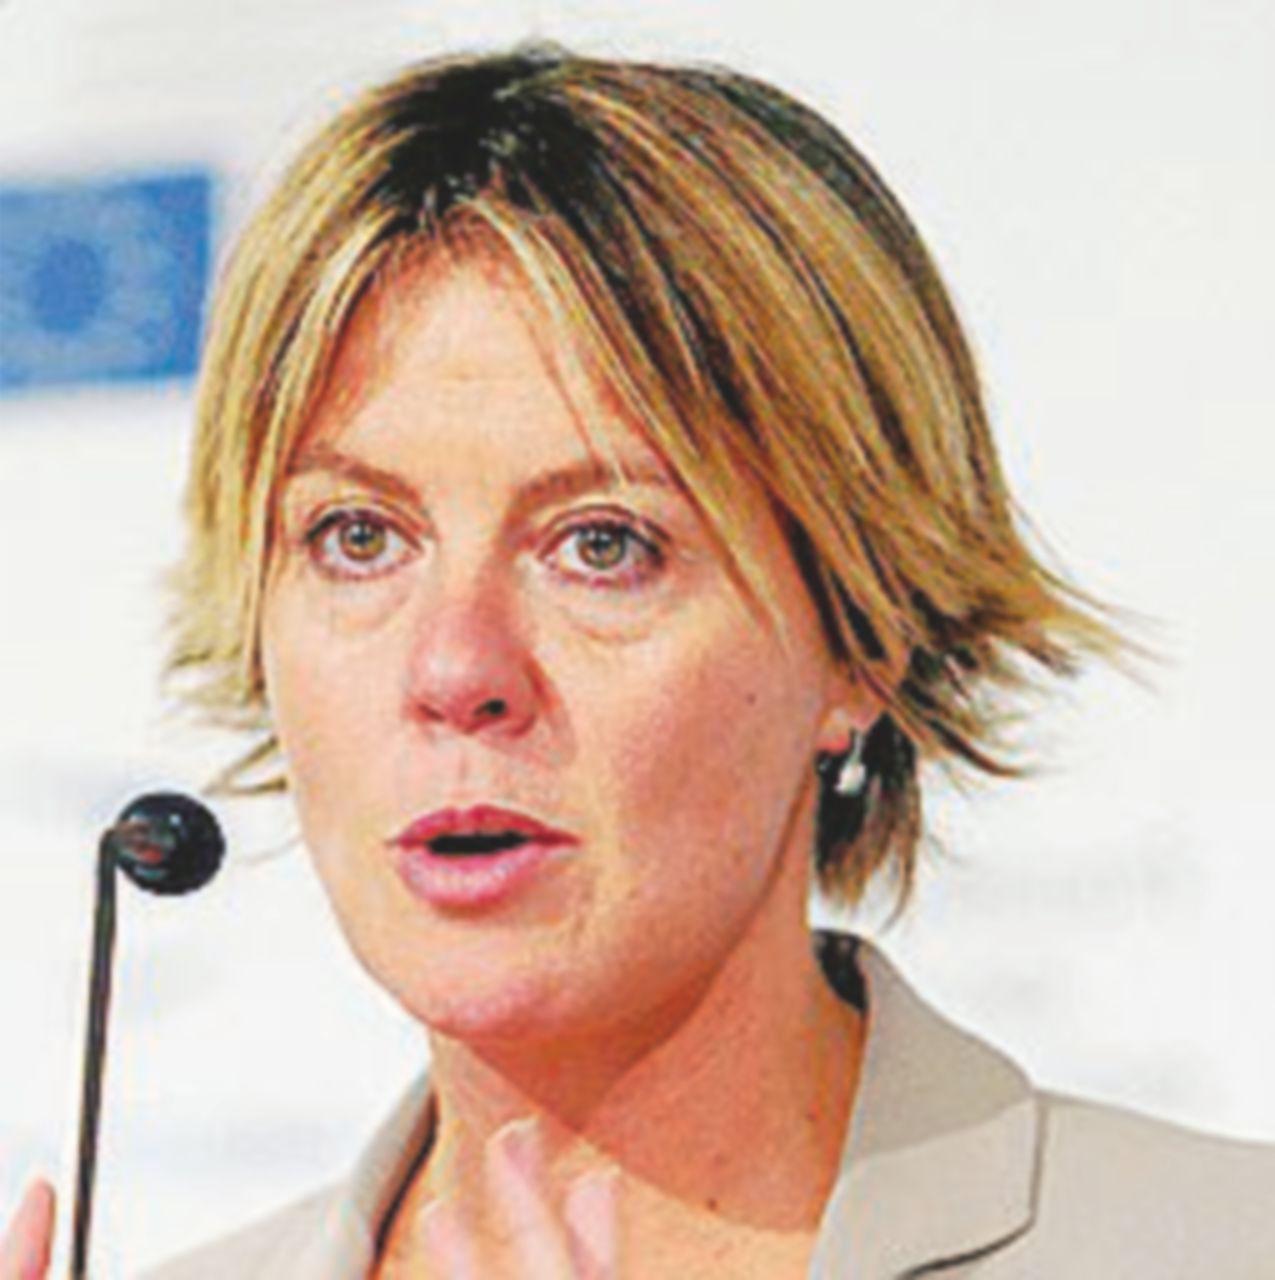 Decreto tutela cavalli, Lorenzin blocca il palio: Asti protesta